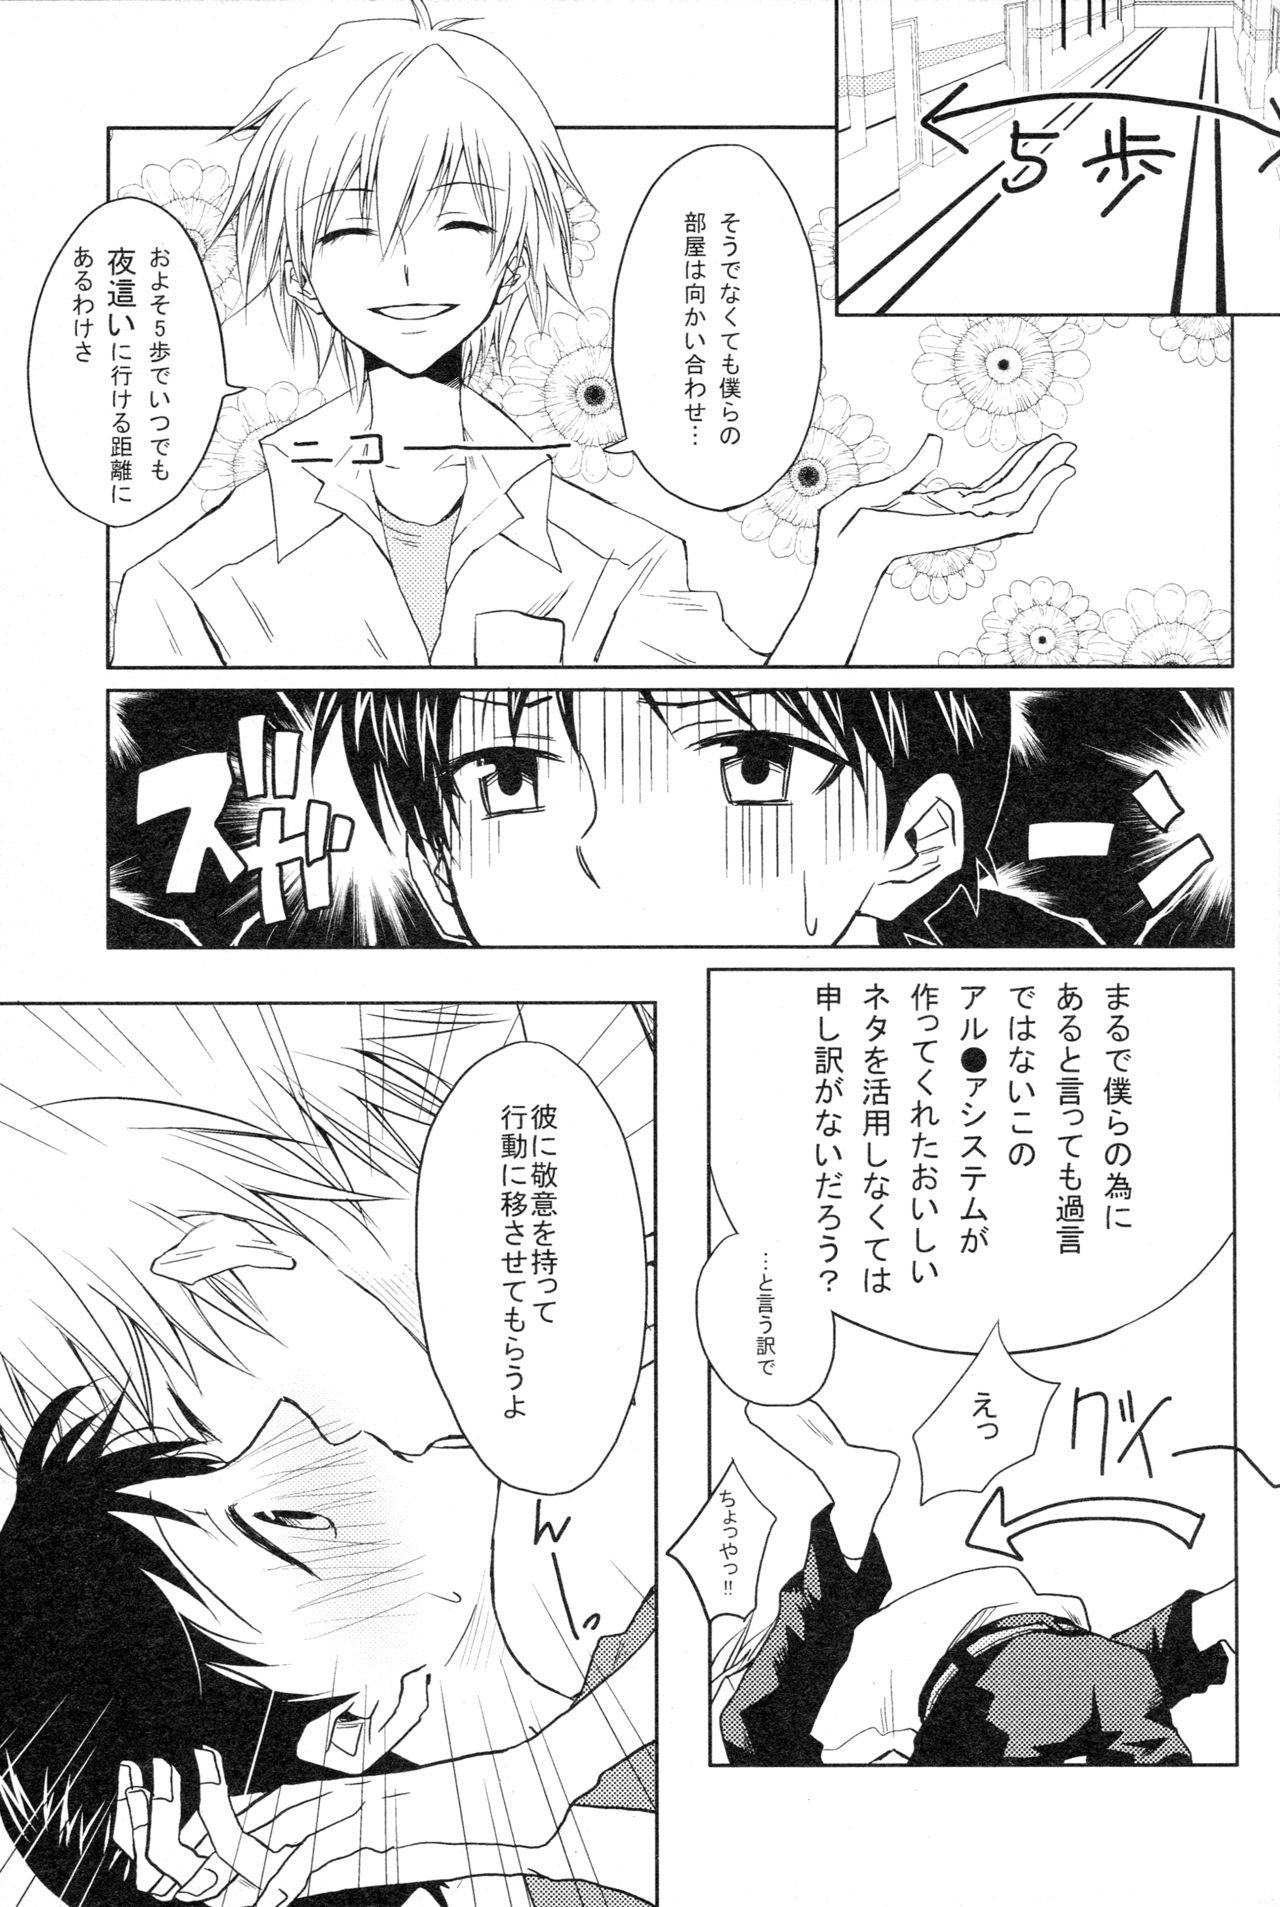 PSP Eva 2 no Susume 5